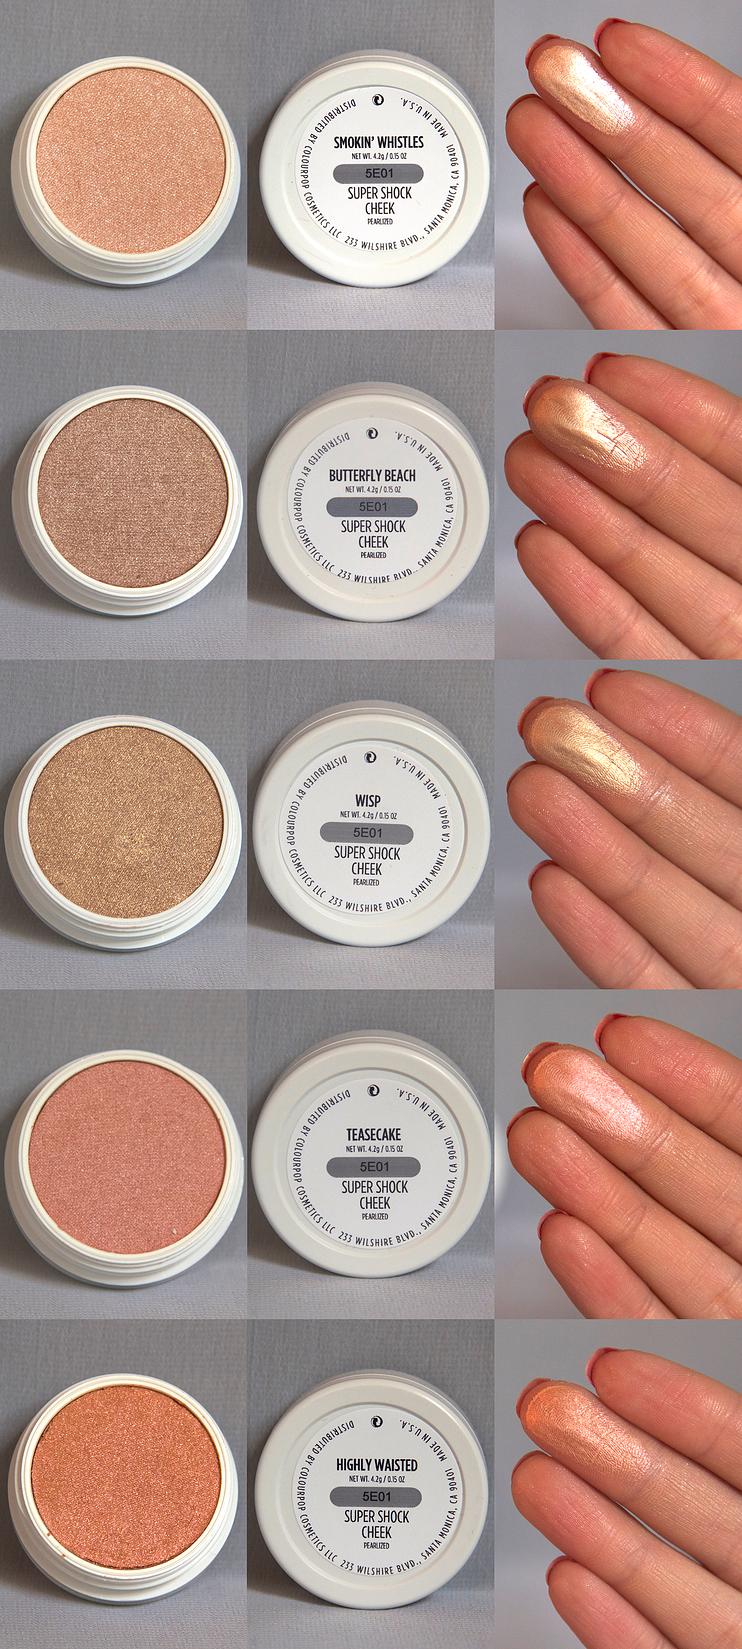 Colourpop Kylie Cosmetics: Colourpop Highlighter Collection & Swatches